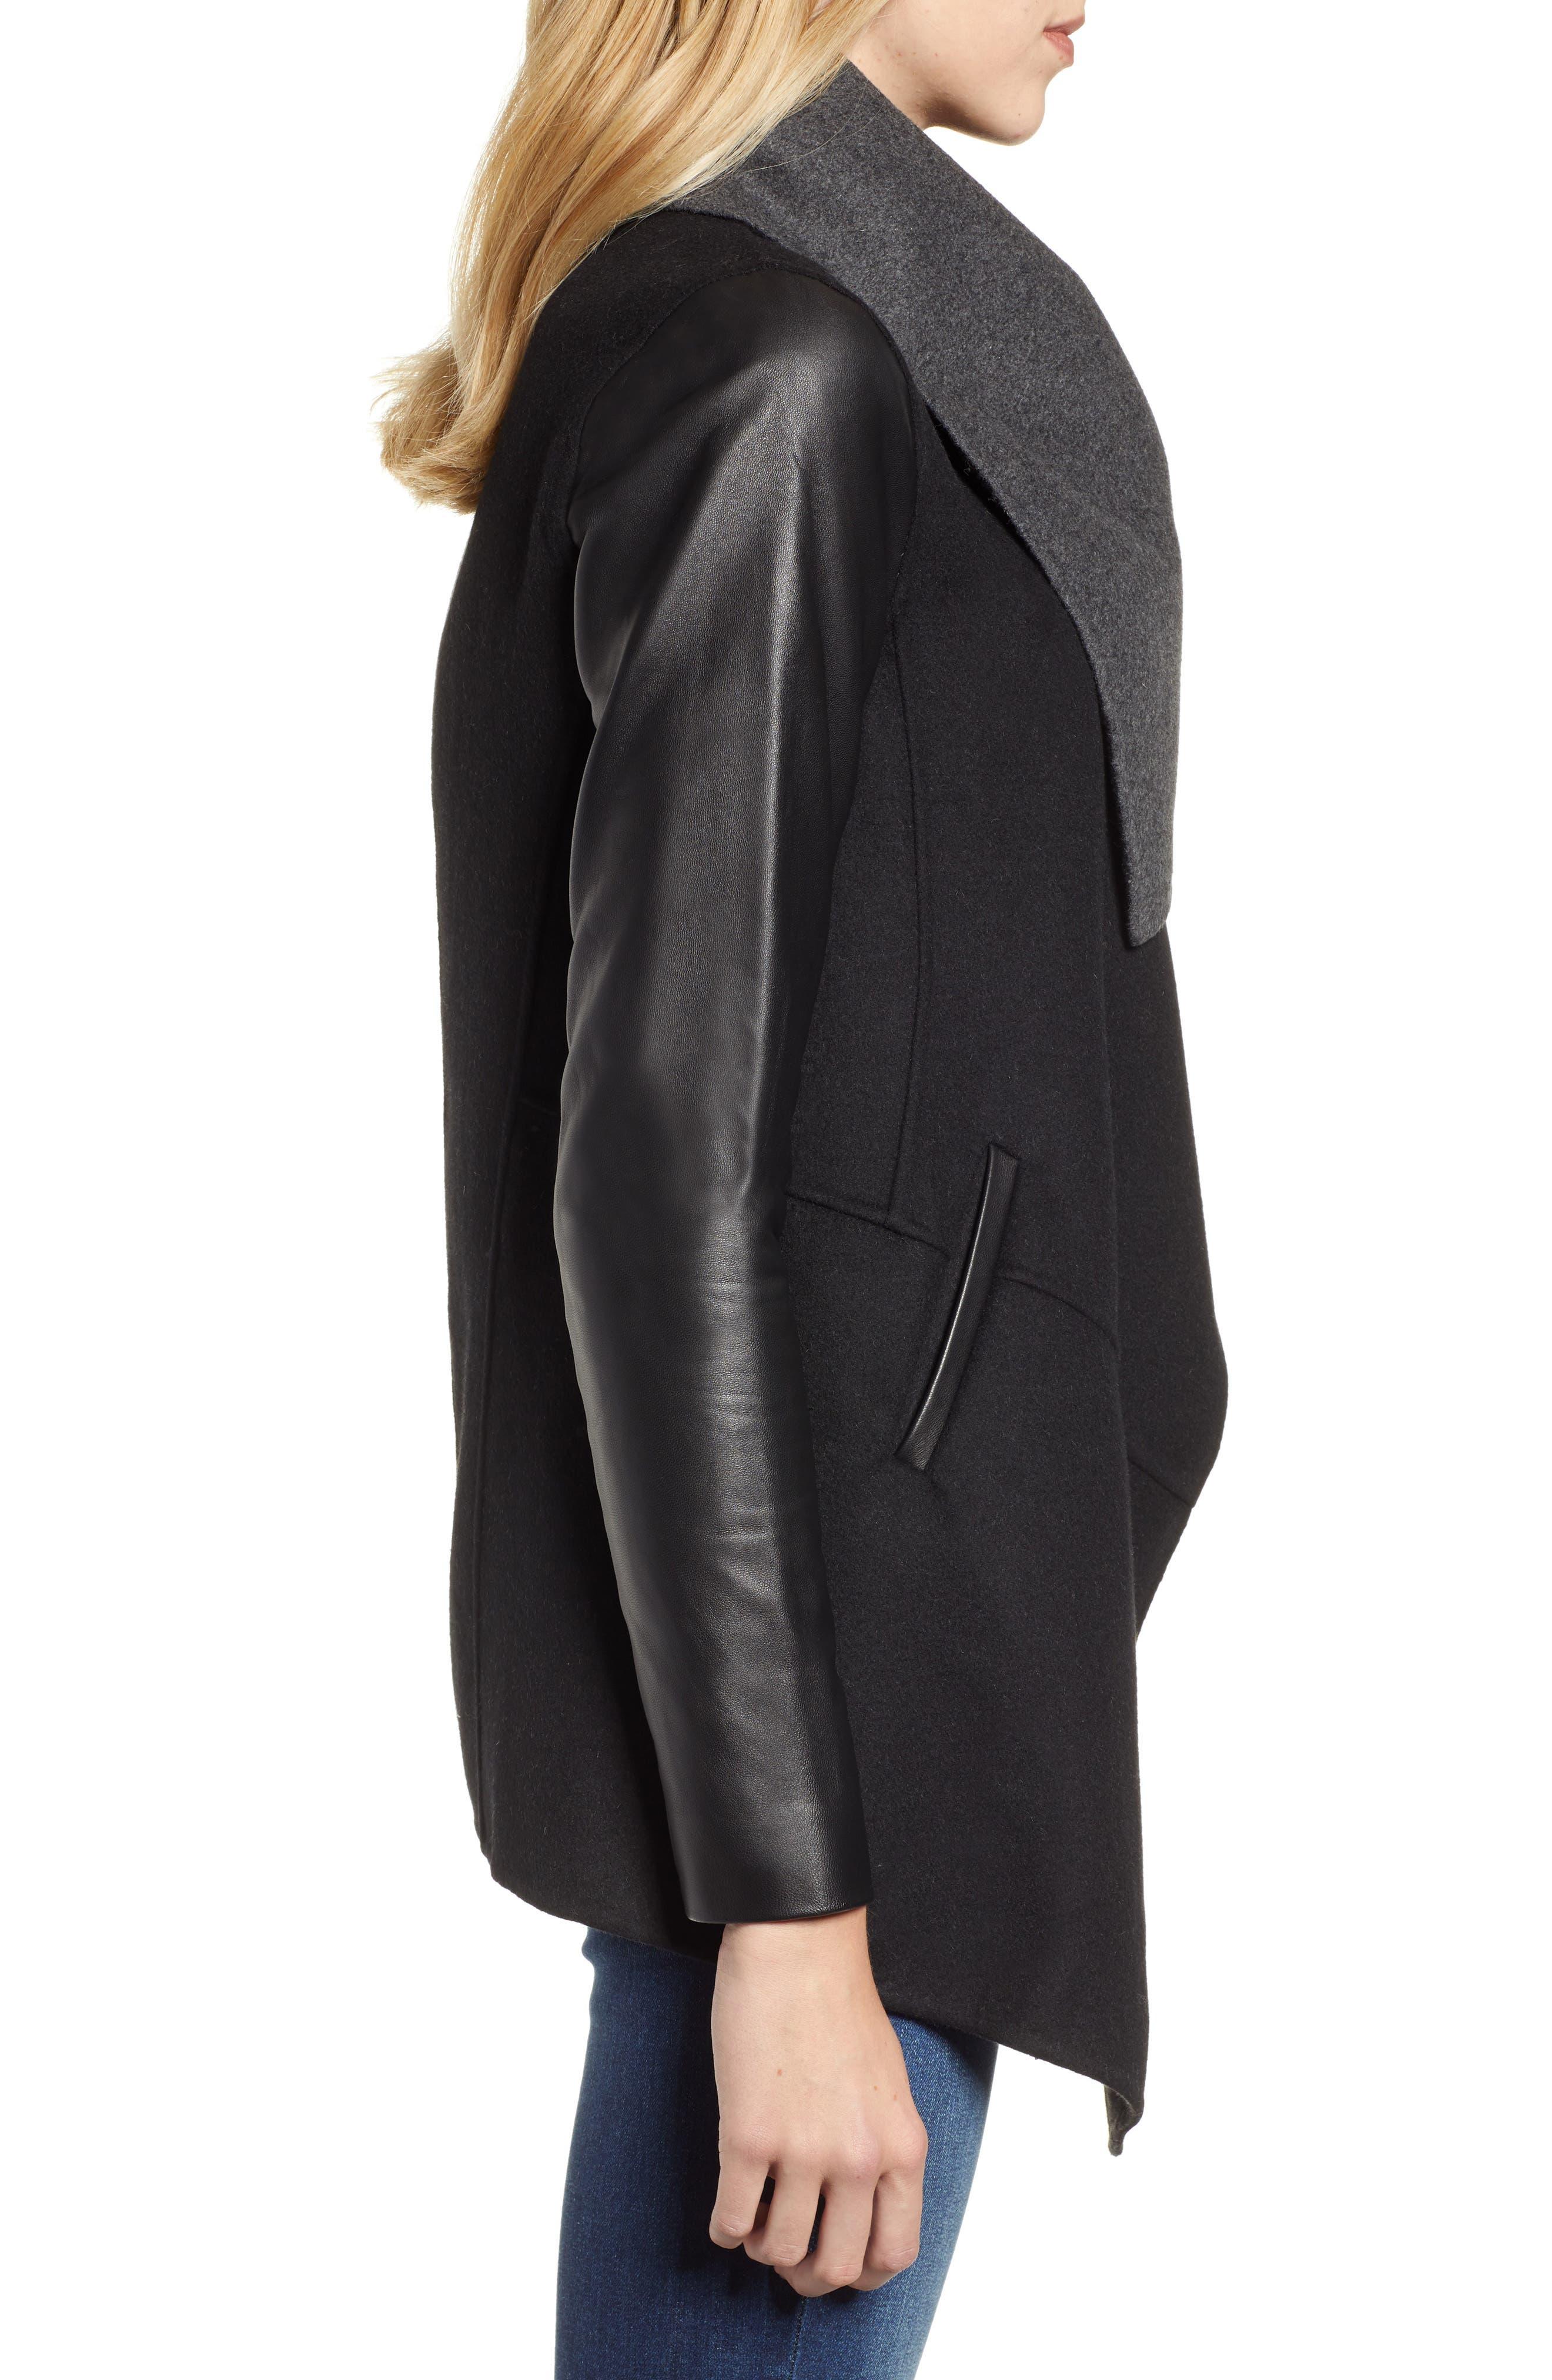 Vane Asymmetrical Leather Sleeve Coat,                             Alternate thumbnail 3, color,                             BLACK/ CHARCOAL